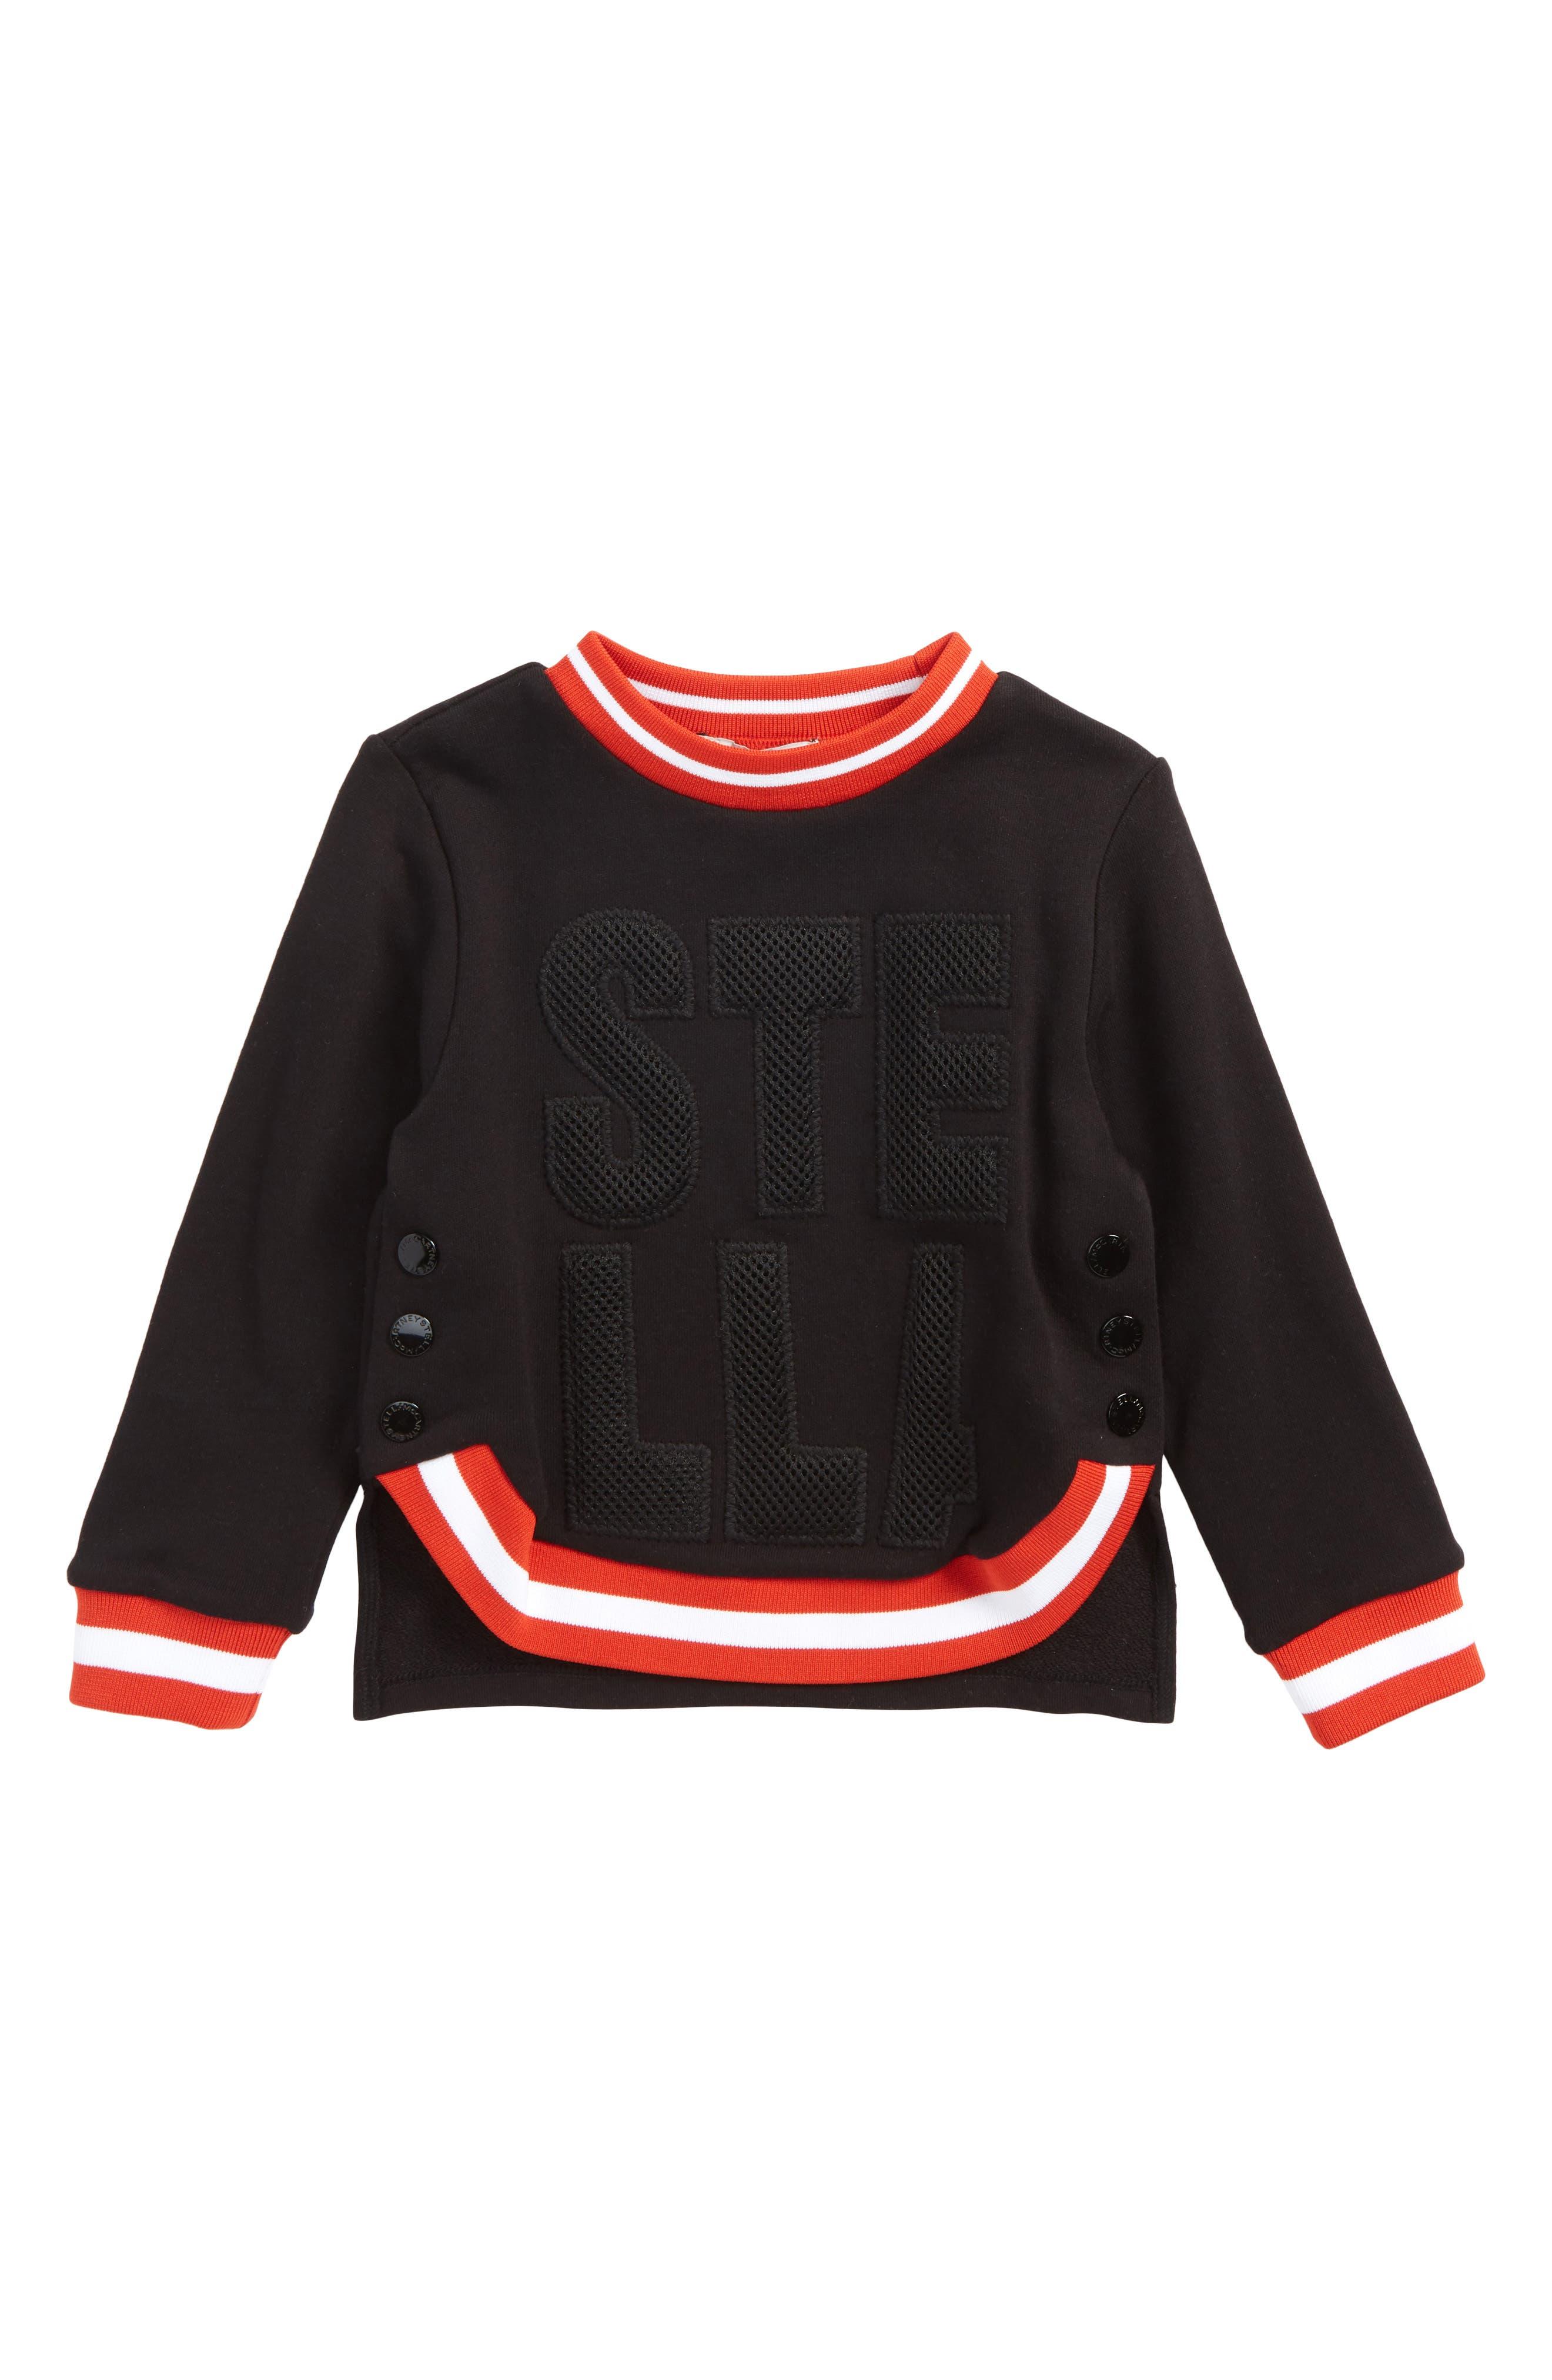 Daya Sweatshirt,                             Main thumbnail 1, color,                             Black